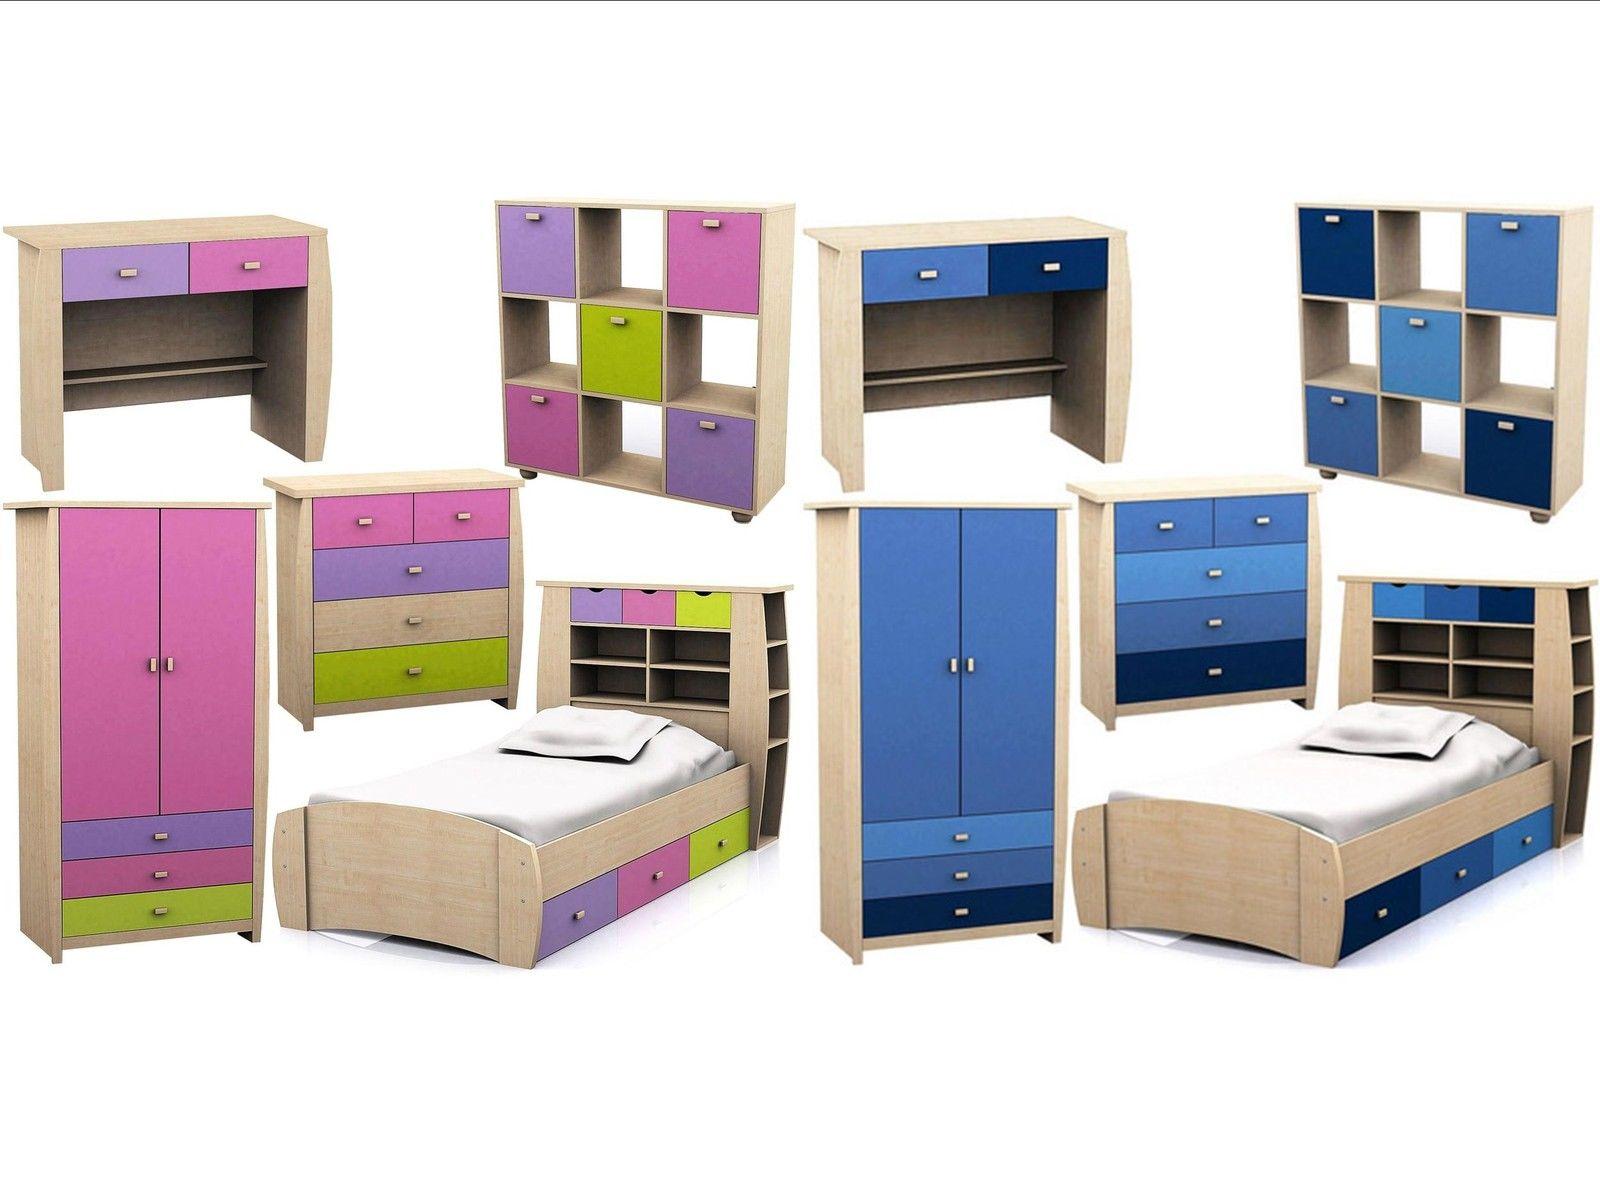 Sydney Childrens Bedroom Range Pink Or Blue Storage Bed Wardrobe Desk Chest Ebay